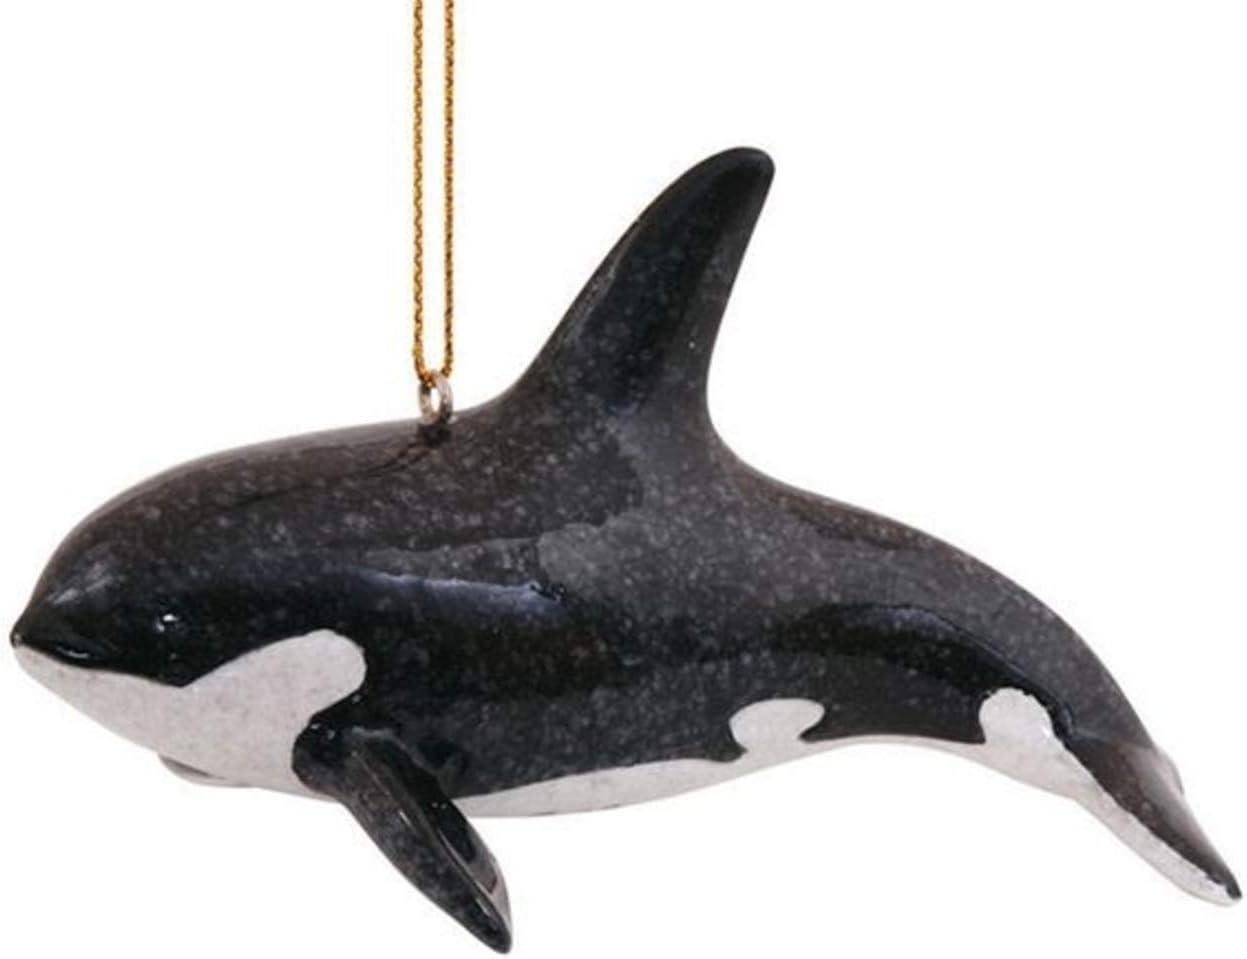 S&C Sea Life Killer Whale Orca Dolphin Hanging Christmas Ornament | Nautical Coastal Beach Decor Tree Decorations | Marine Science Ocean Gifts for Men Women